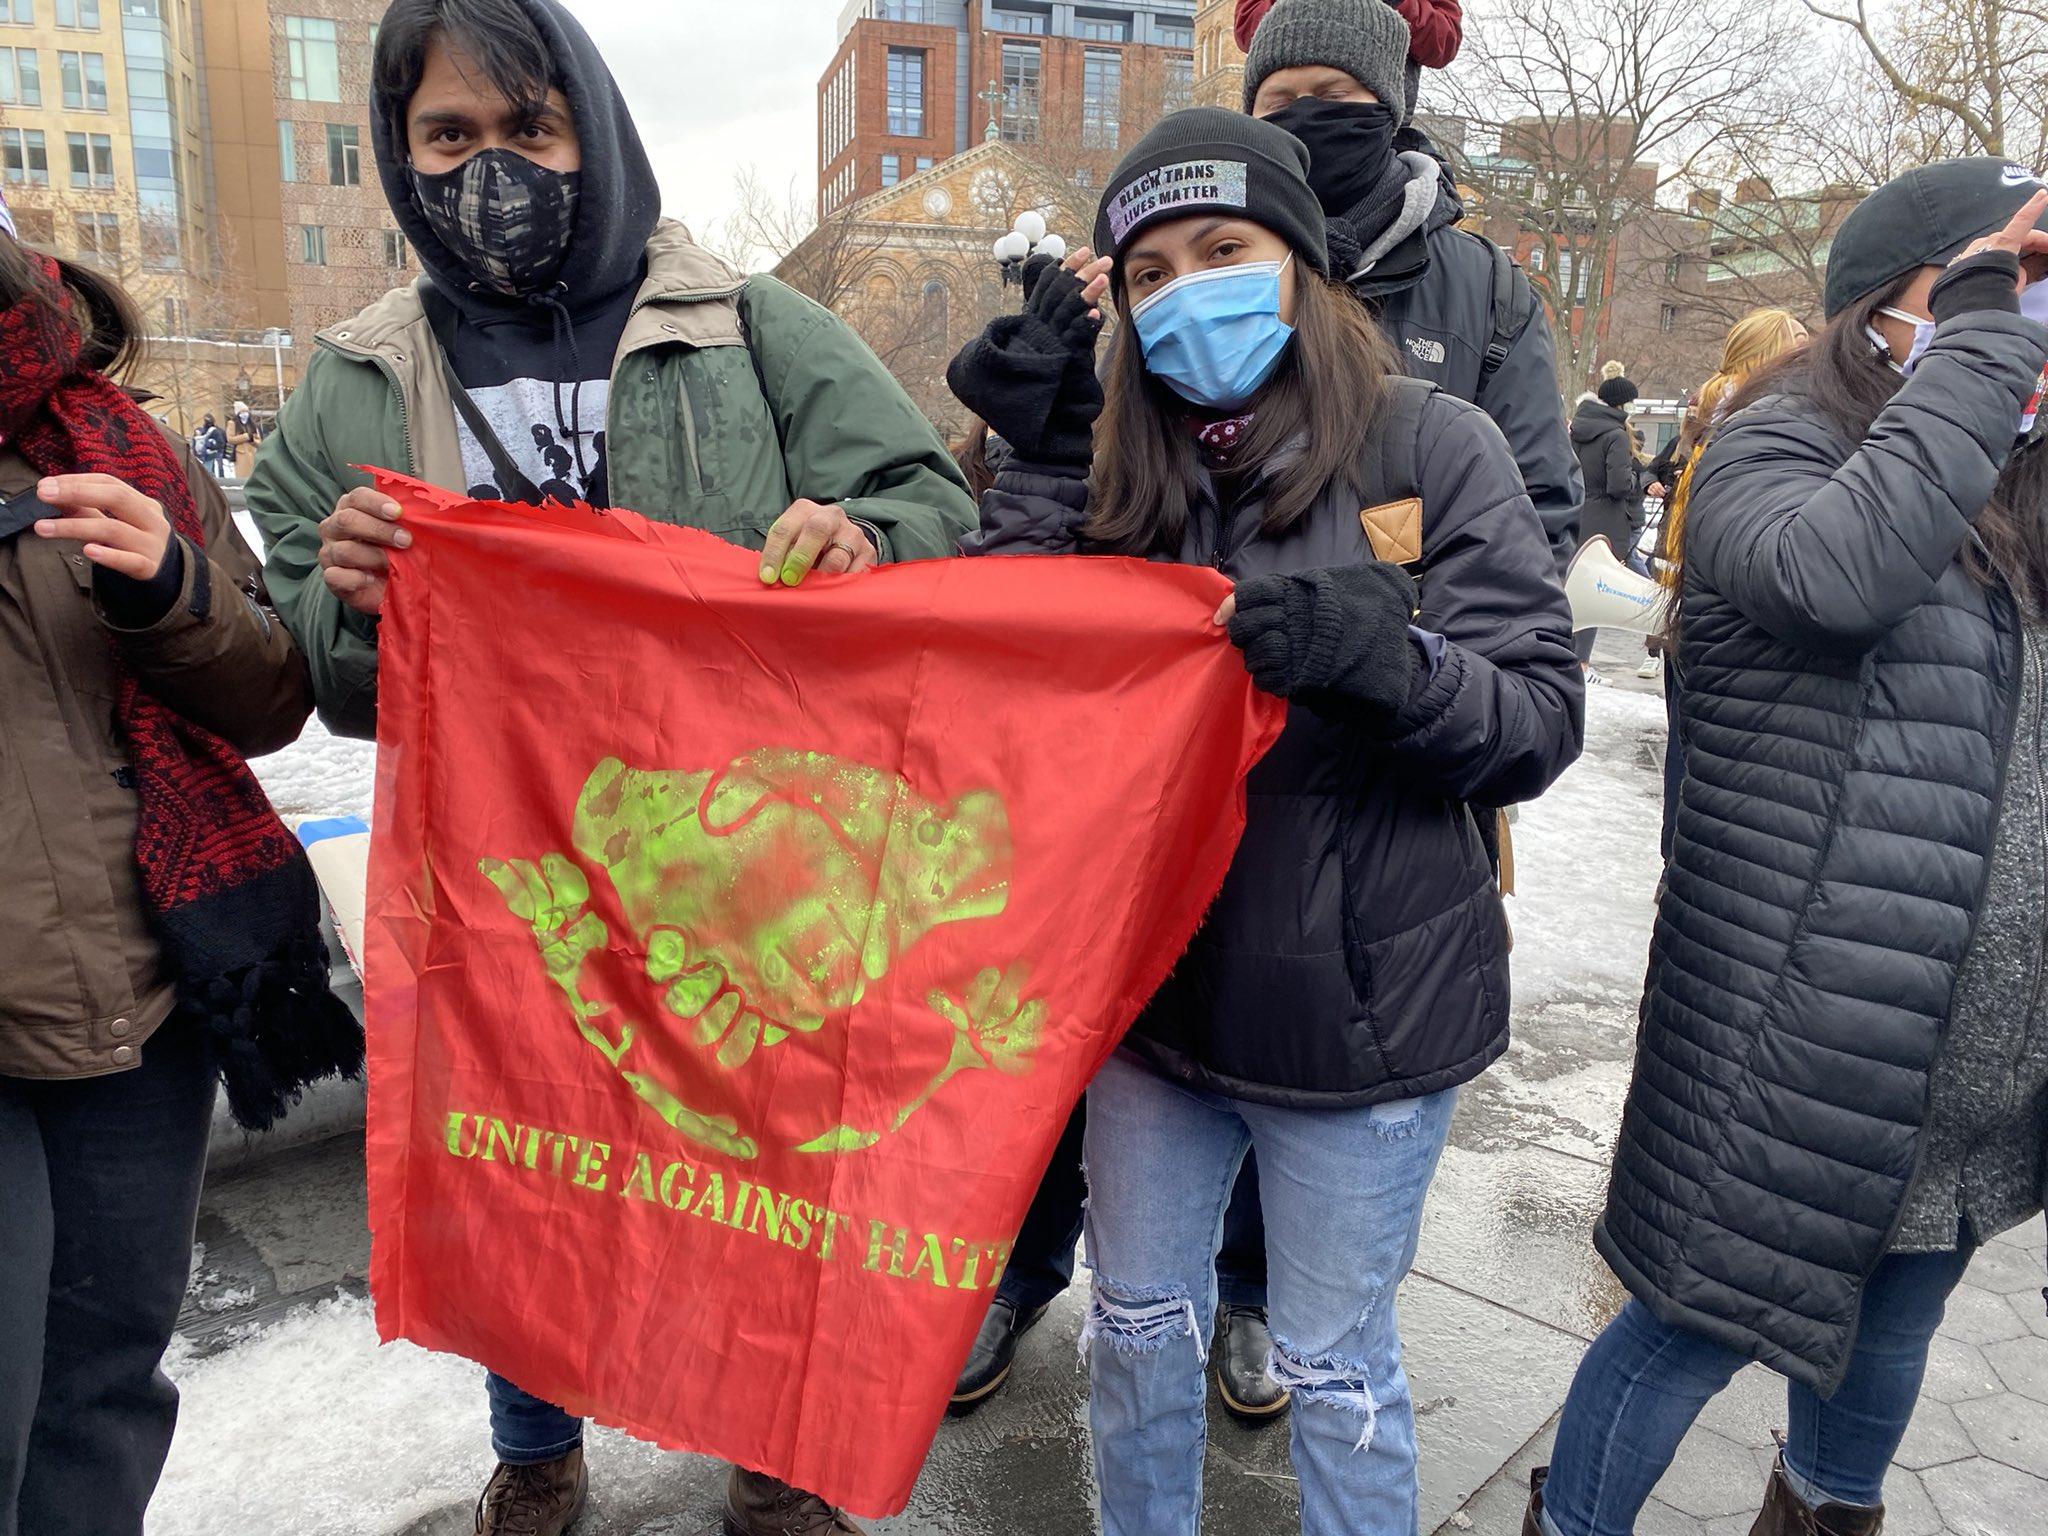 Protestors in Washington Sq Park hold a 'Unite Against Hate' flag.